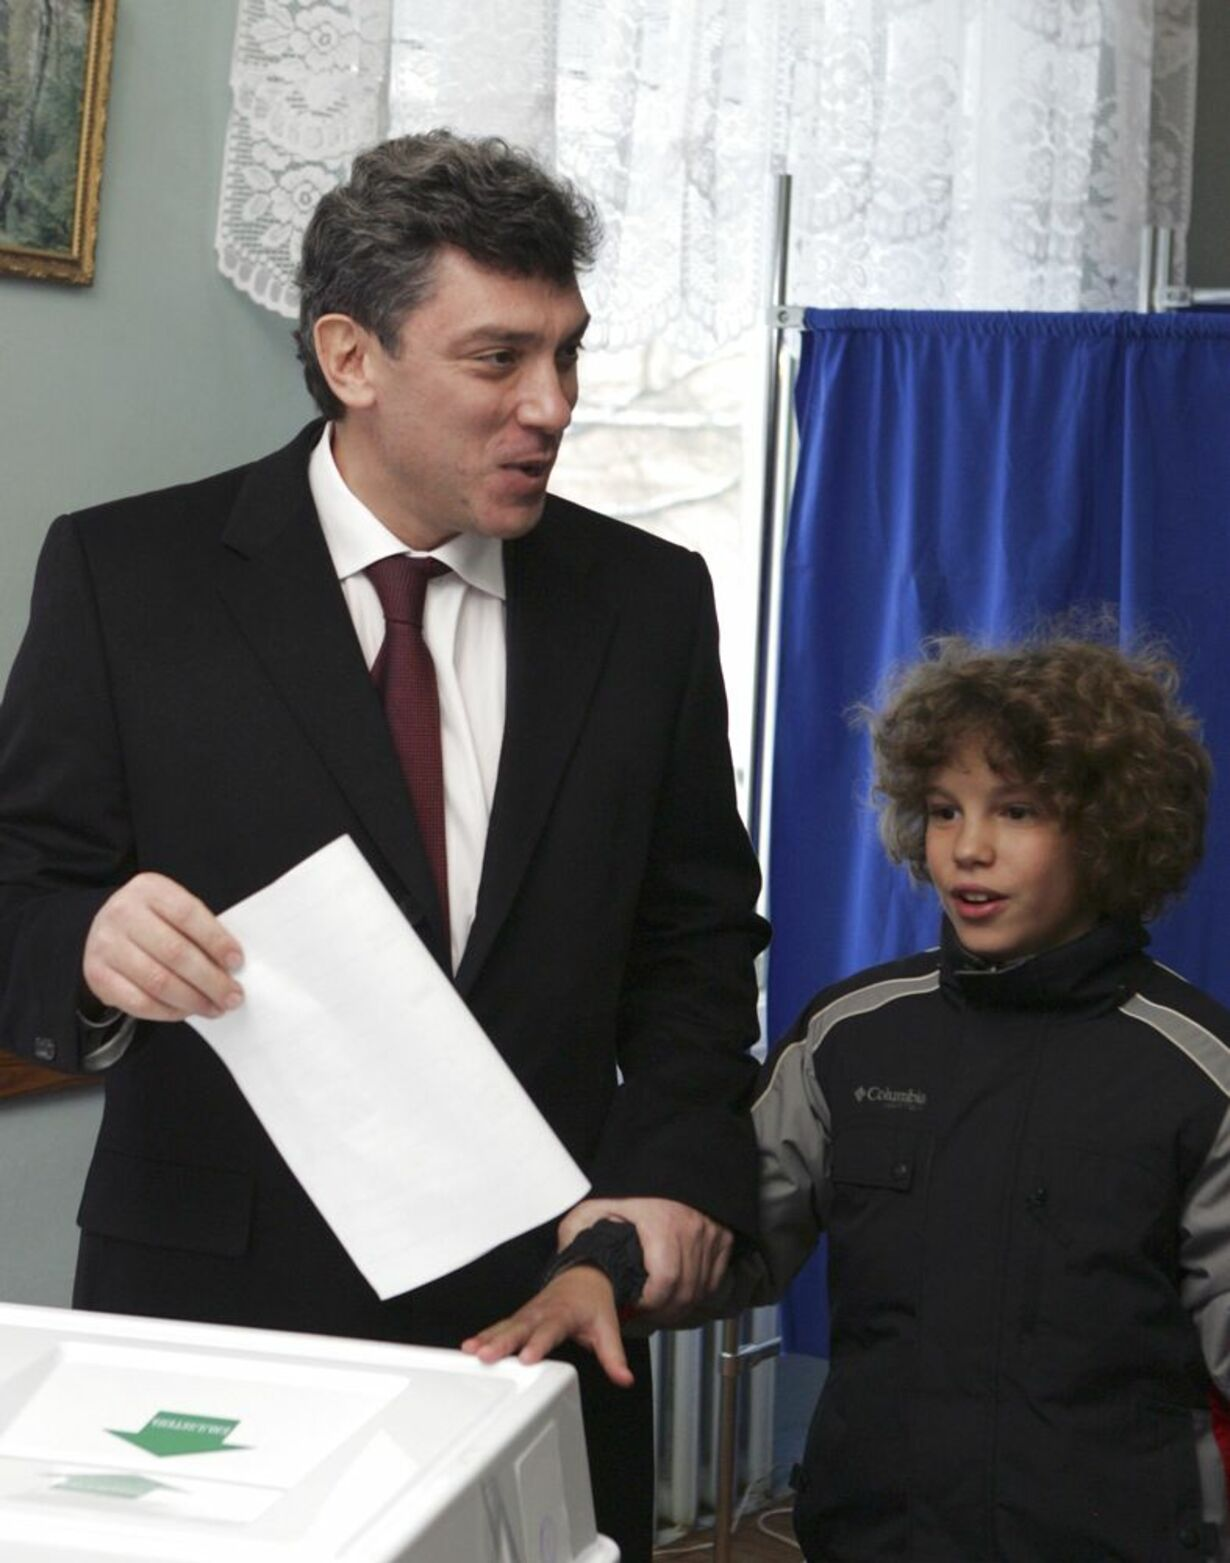 Parlamentsvalg i Rusland  - 5